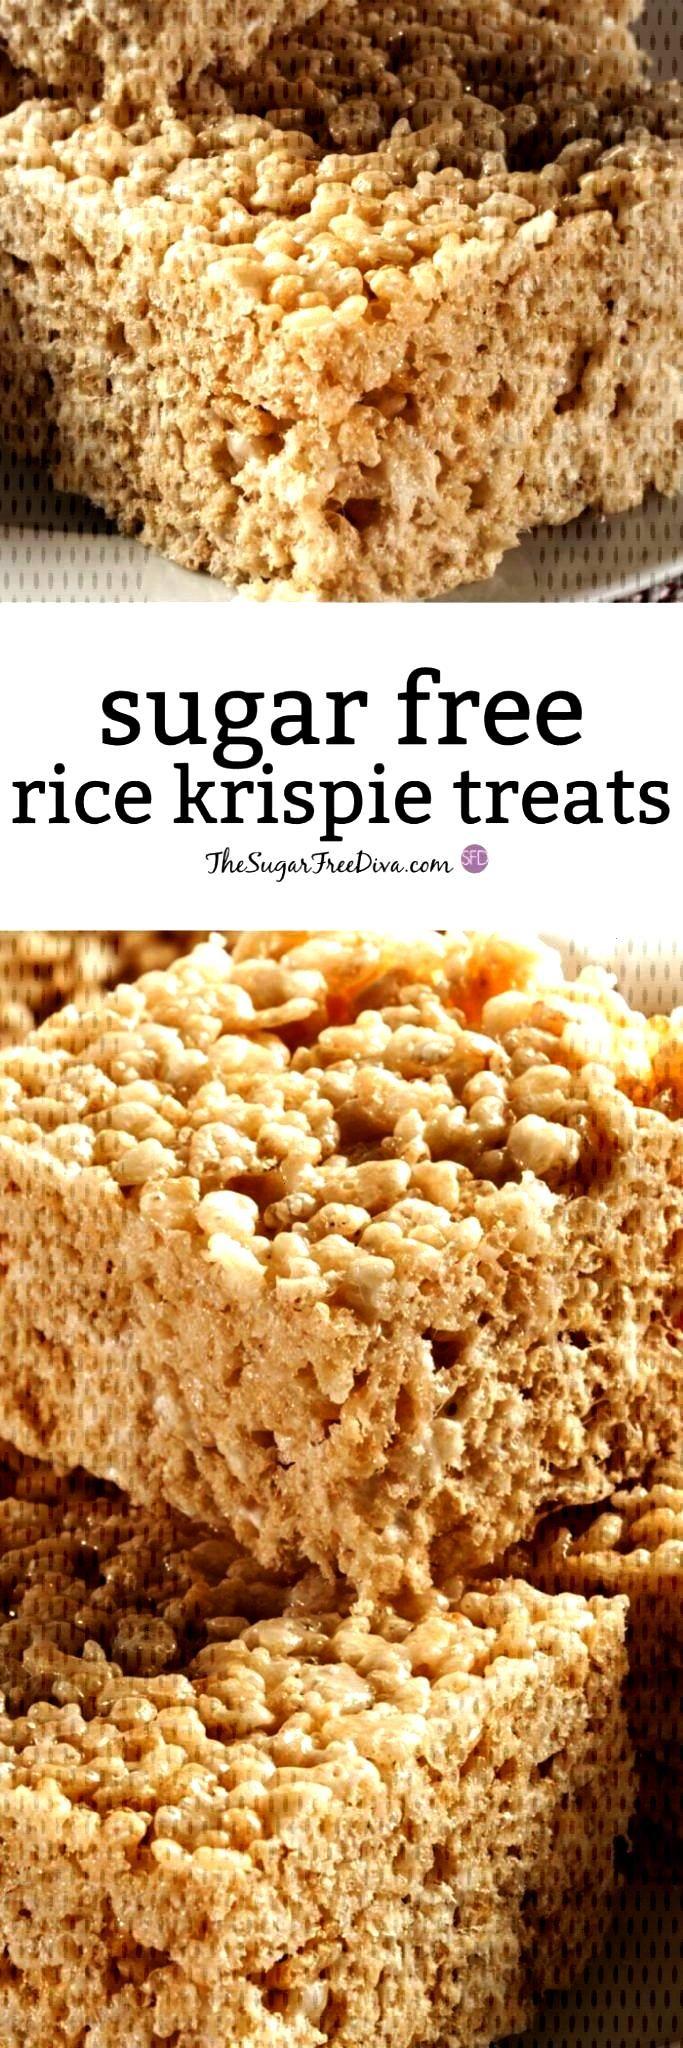 to Make Sugar Free Rice Krispie TreatsHow to Make Sugar Free Rice Krispie Treats  We all love fresh